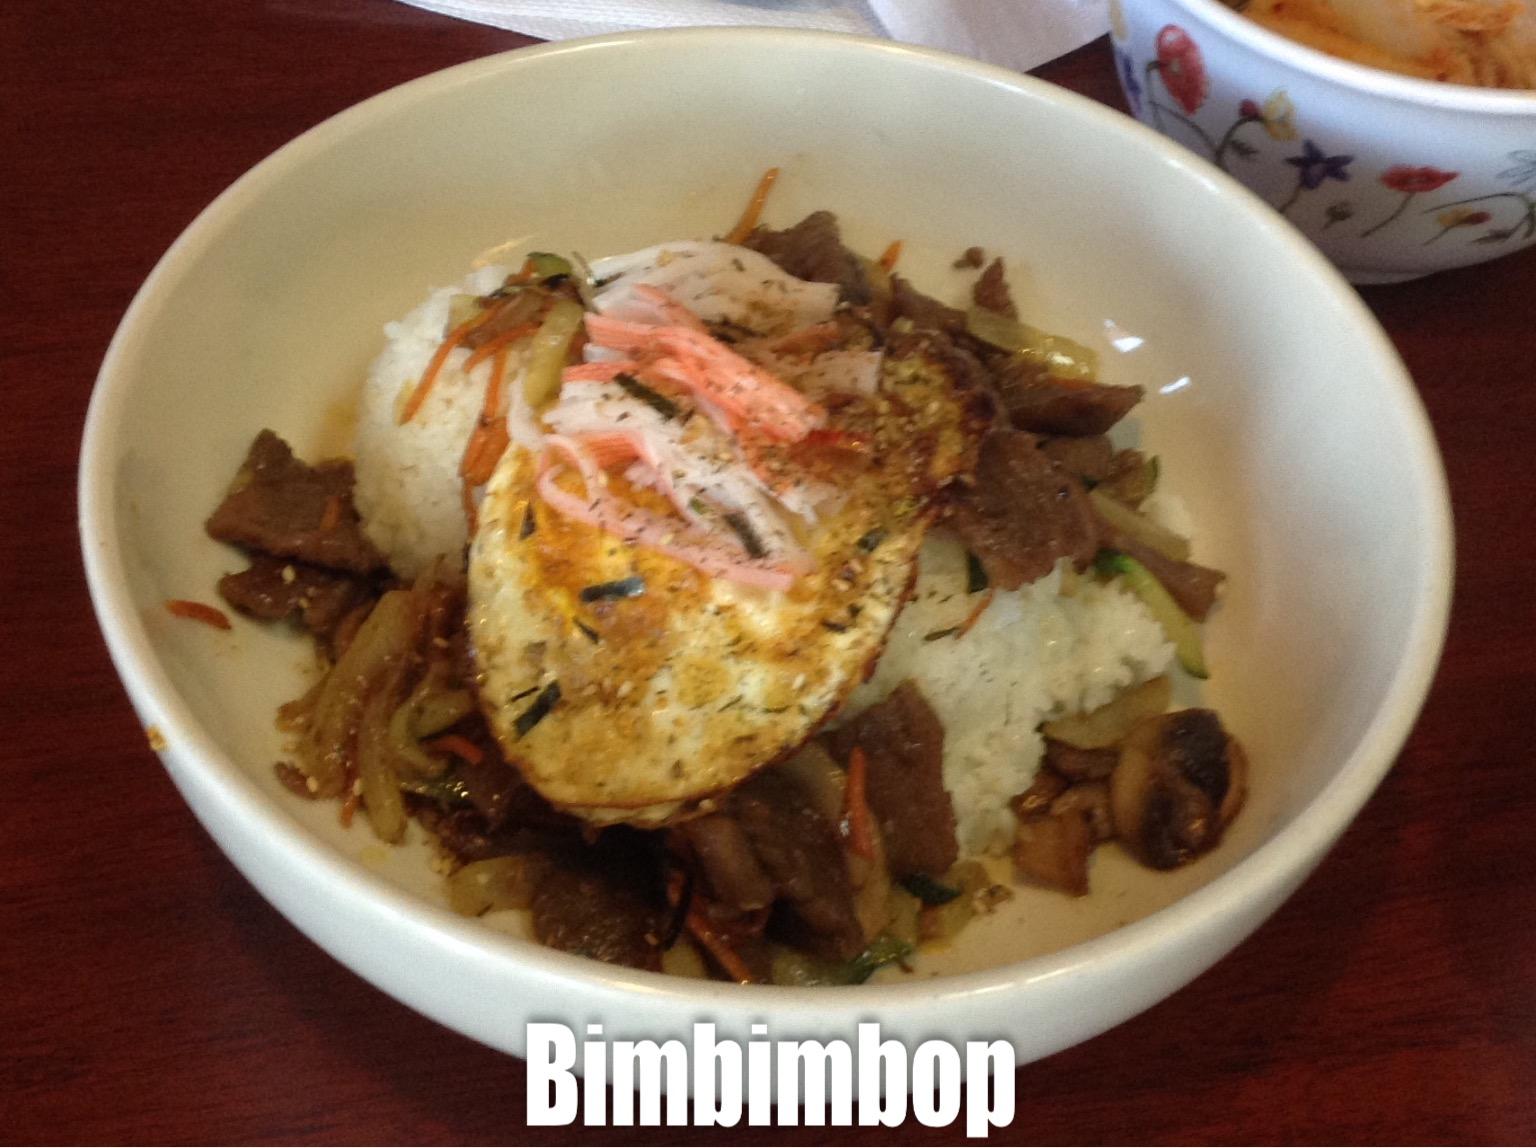 Bim Bim Bop Image